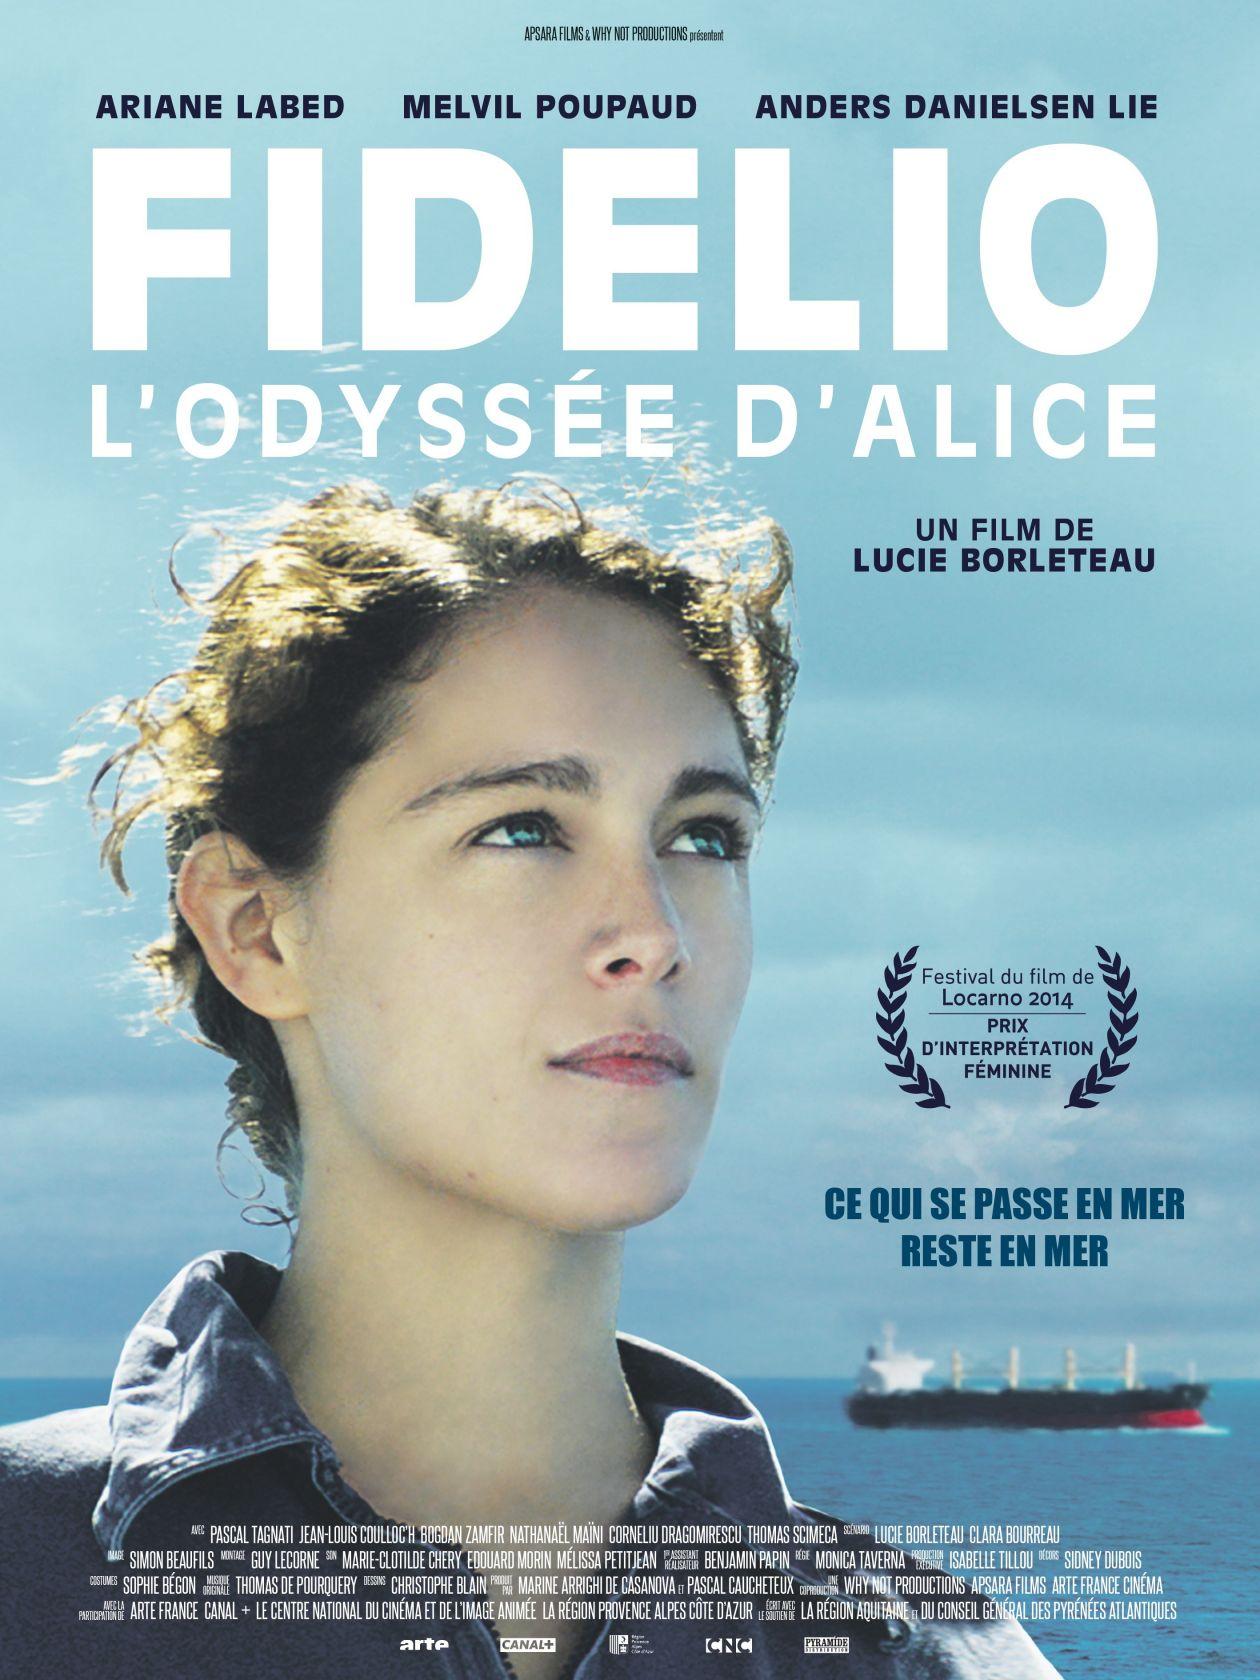 Ariane Labed  FIDELIO, L'ODYSSEE D'ALICE | Lucie Borleteau 2014